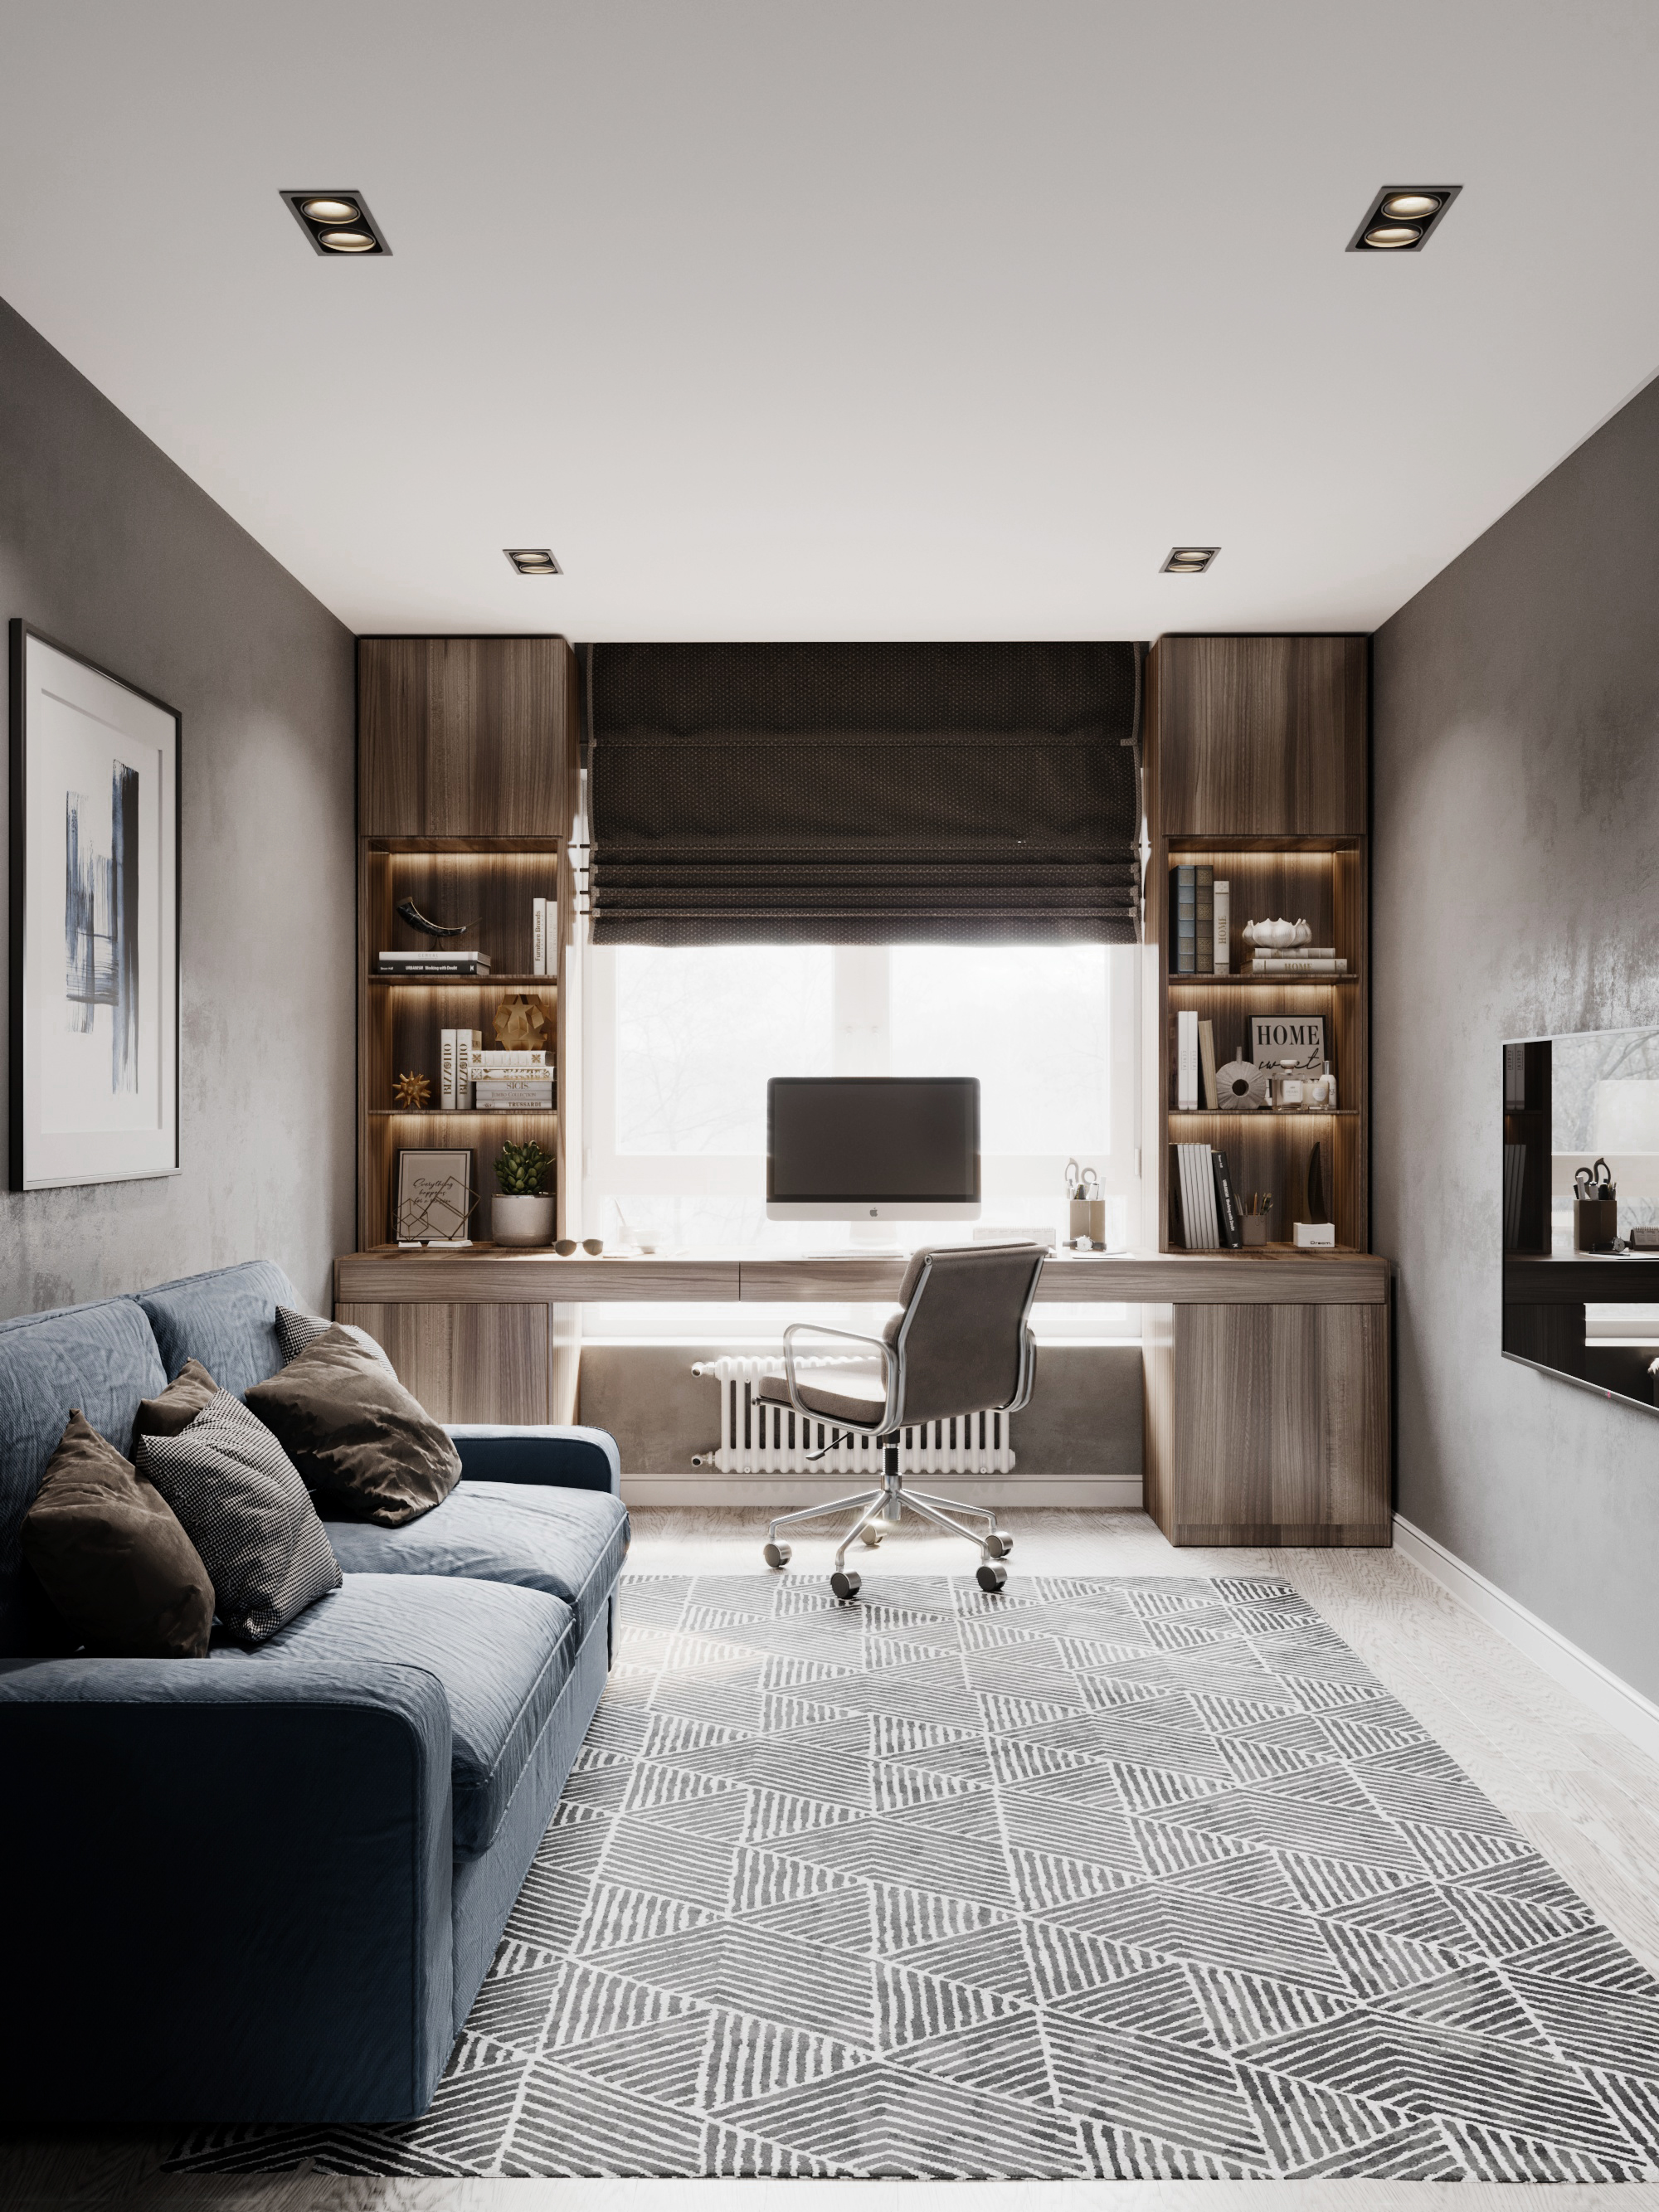 Дизайн комнаты в двухкомнатной квартире